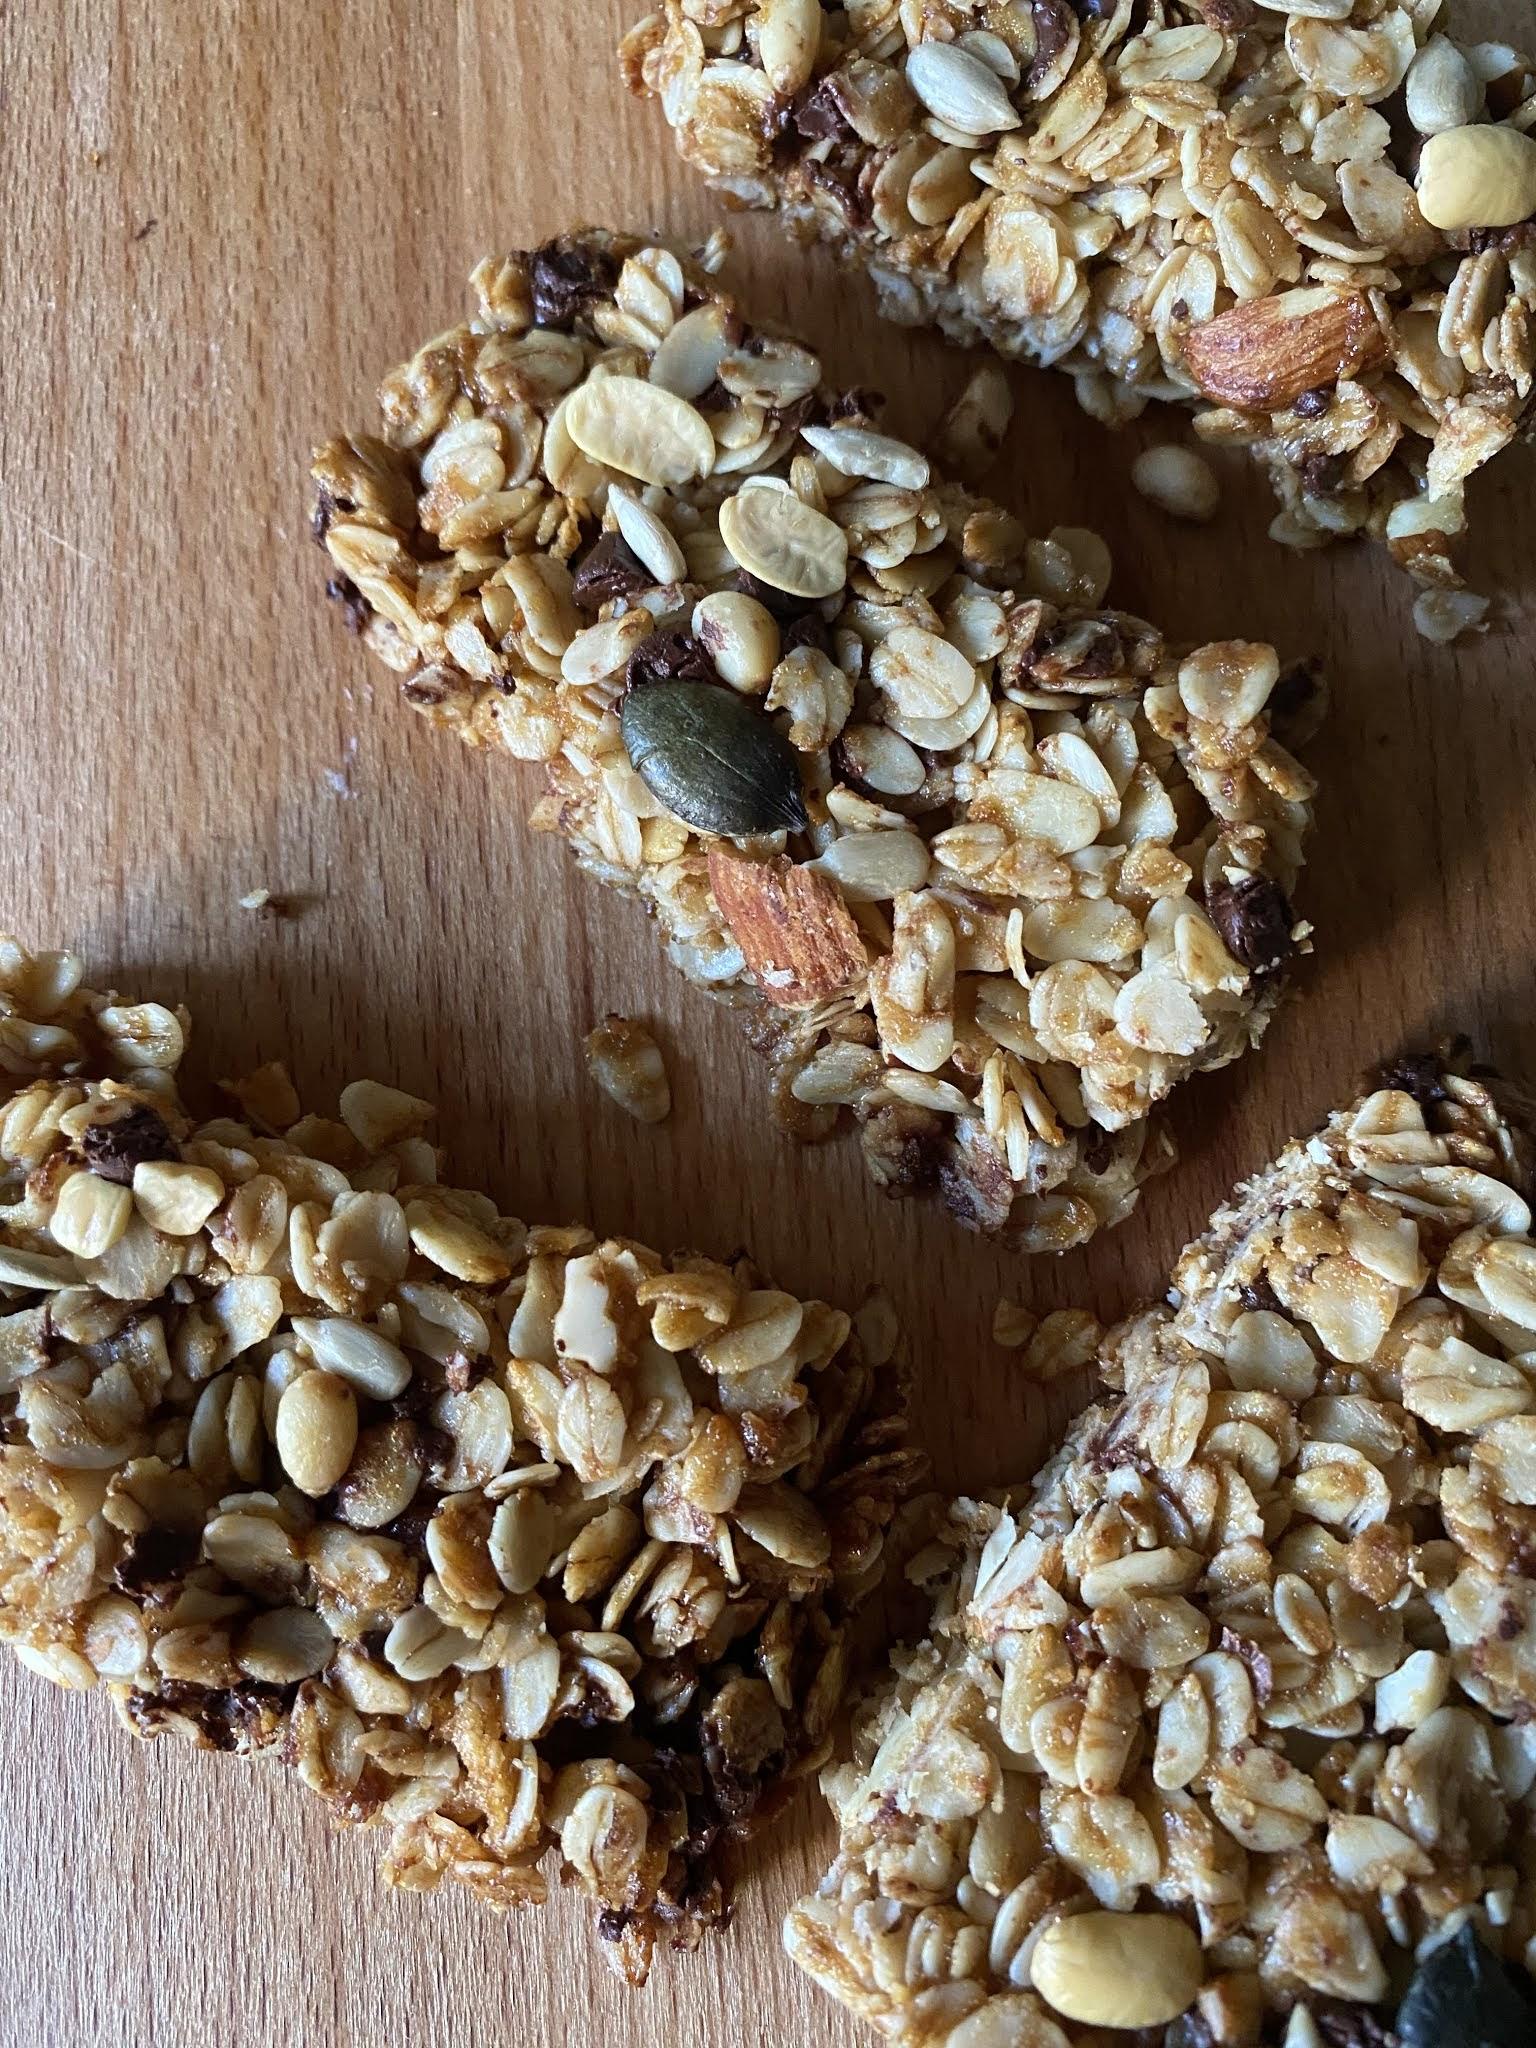 Natural Homemade Granola Bars Healthy Bars By Anu Appetizing Recipes